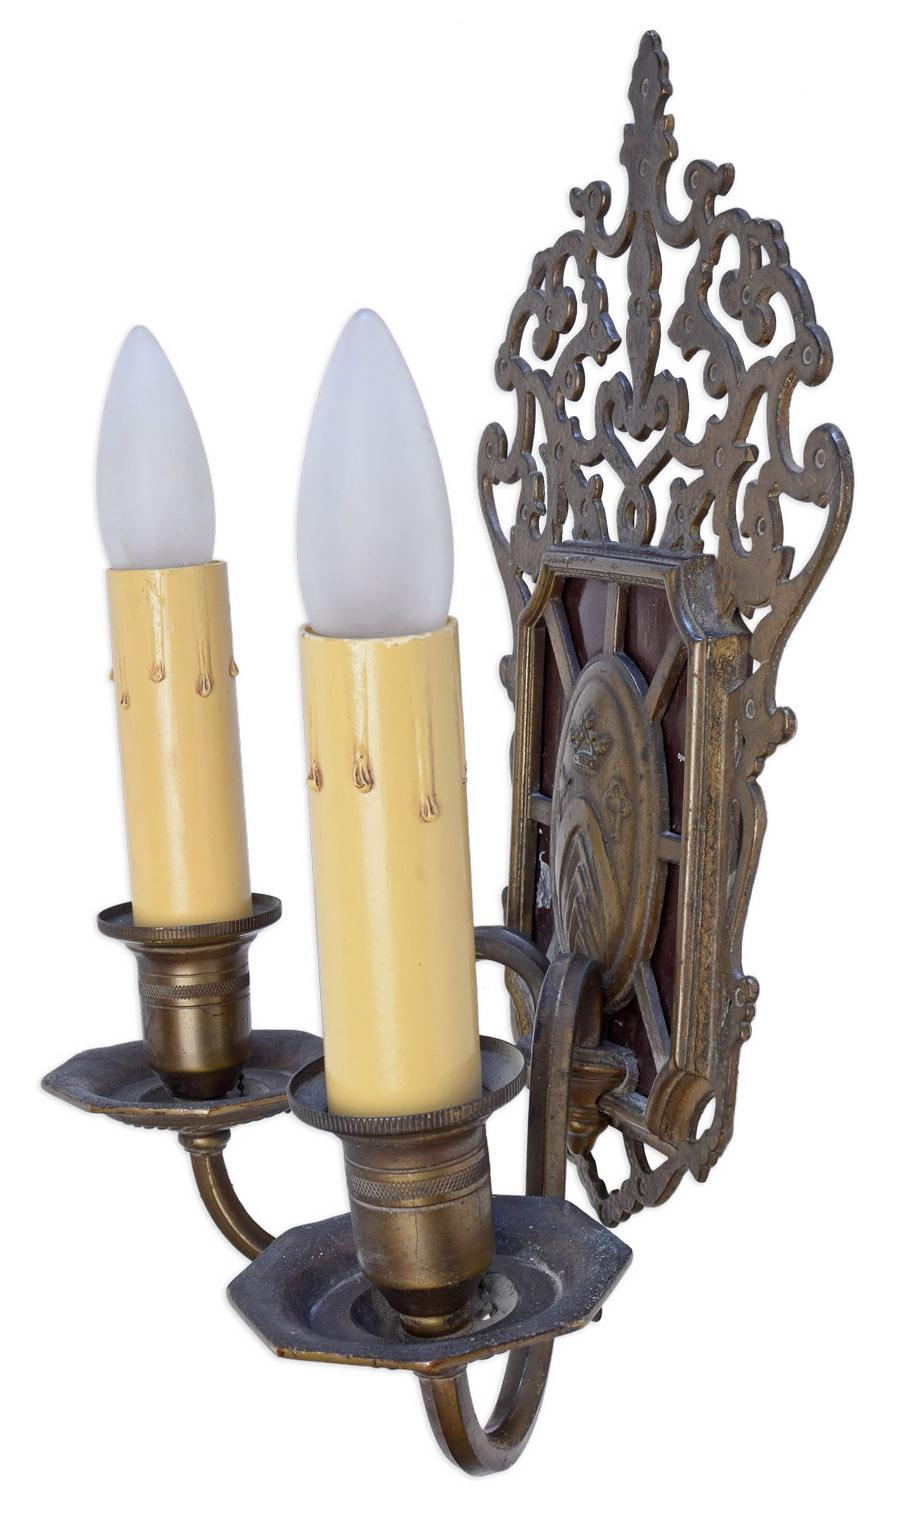 45548-two-arm-brass-filigree-sconce-side.jpg